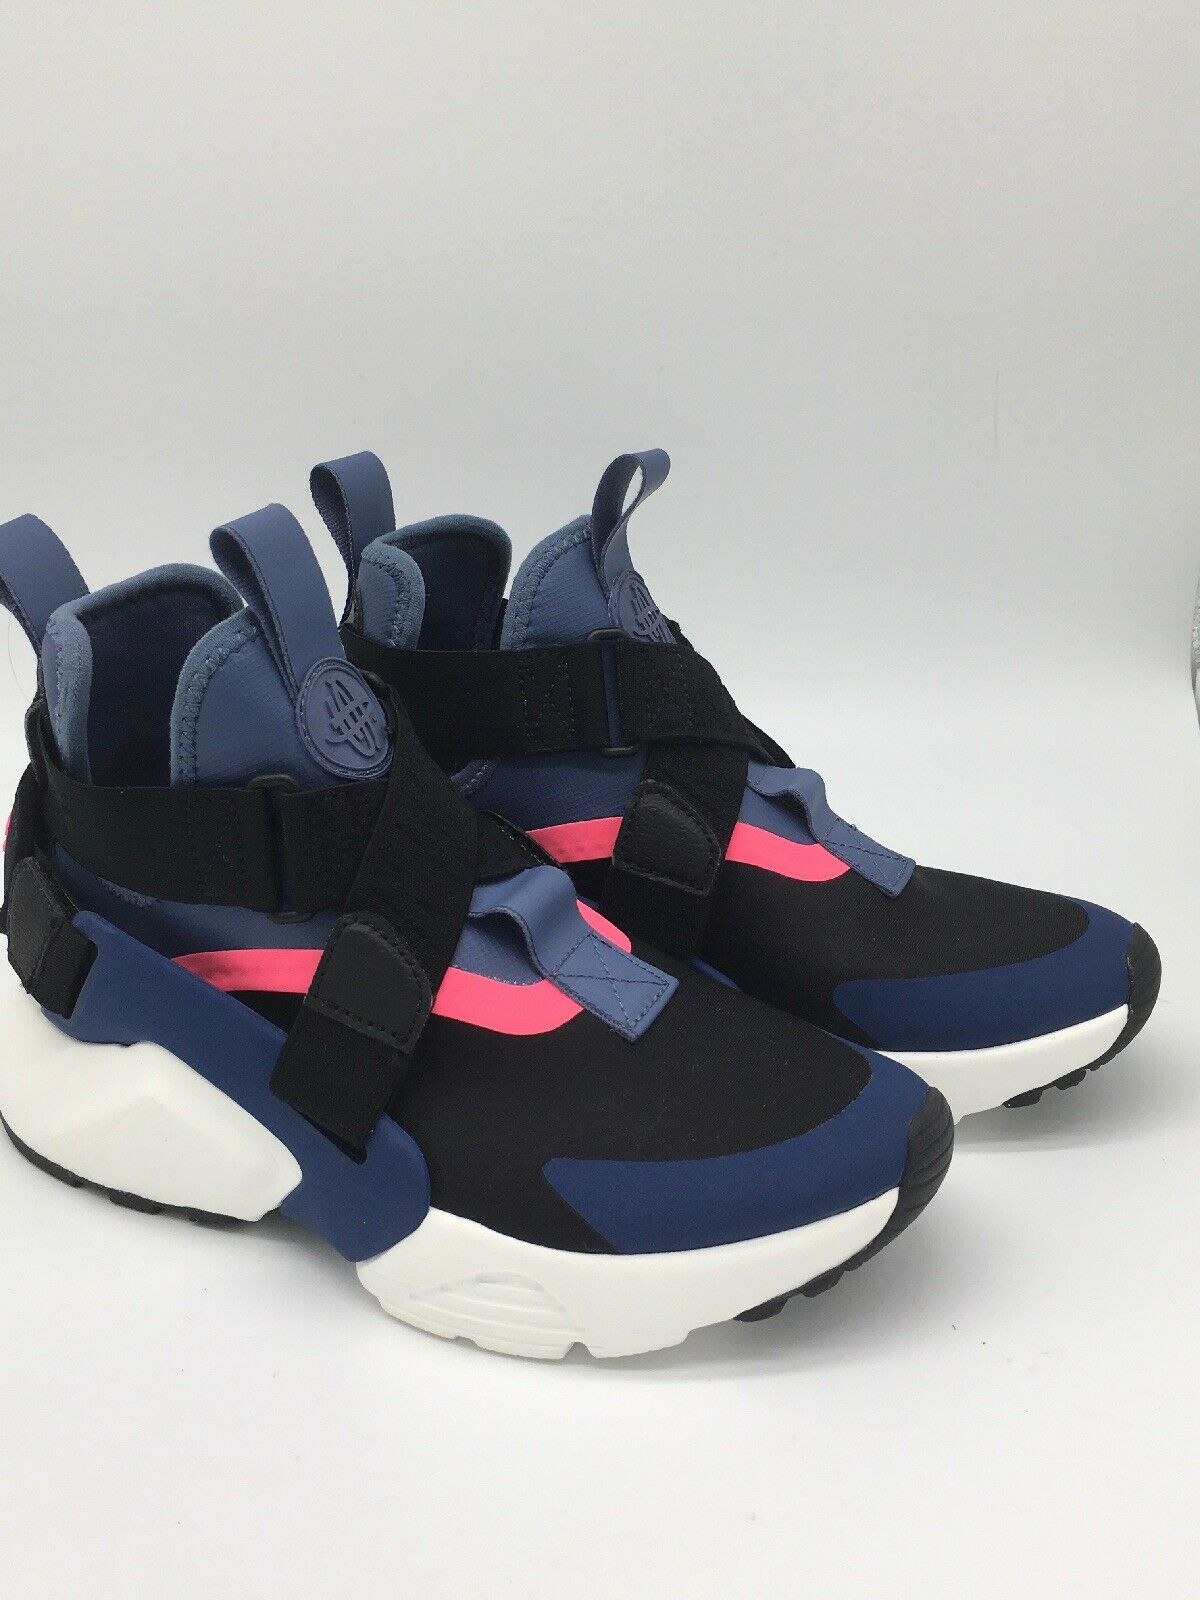 Nike Air Huarache City Strap Navy Black Pink Women Running Shoes AH6787-002 sz 5